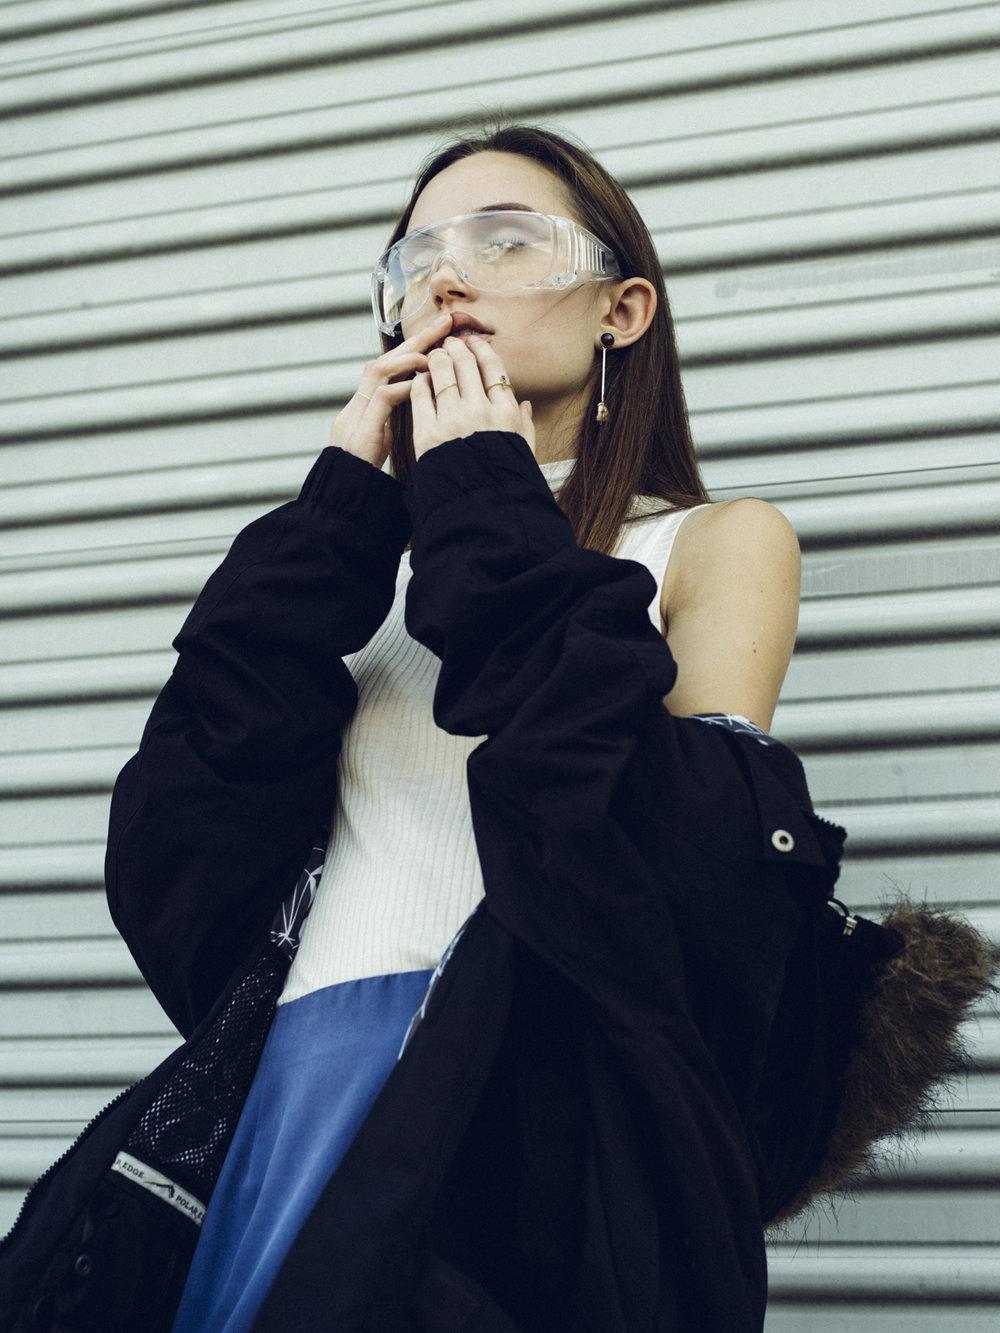 style & art direction // ana davidson  model // leah goodrich